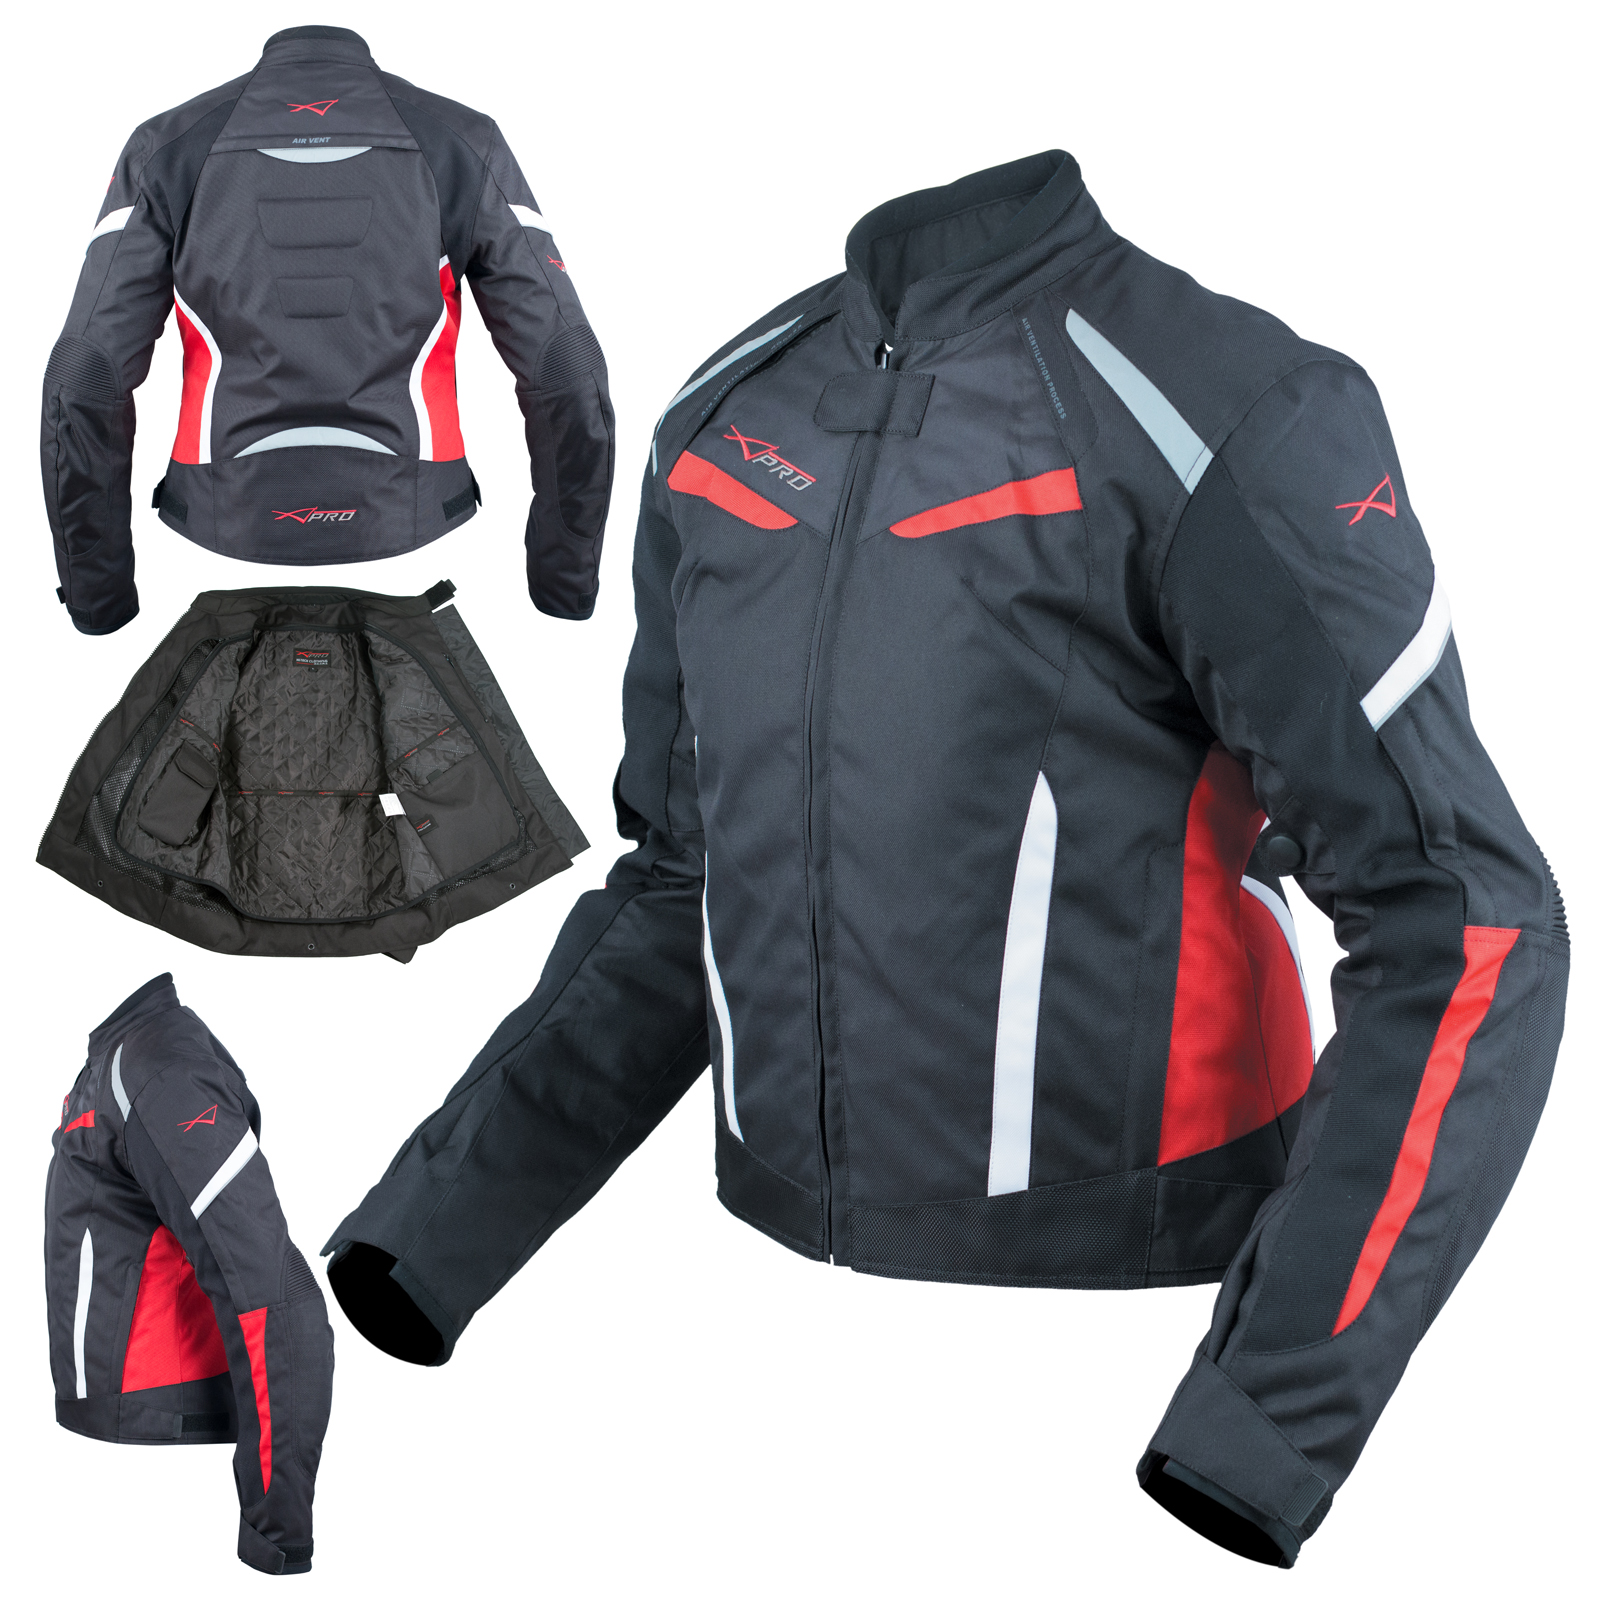 Moto-Giacca-Donna-Sport-Impermeabile-Tessuto-Riflettente-Rosso